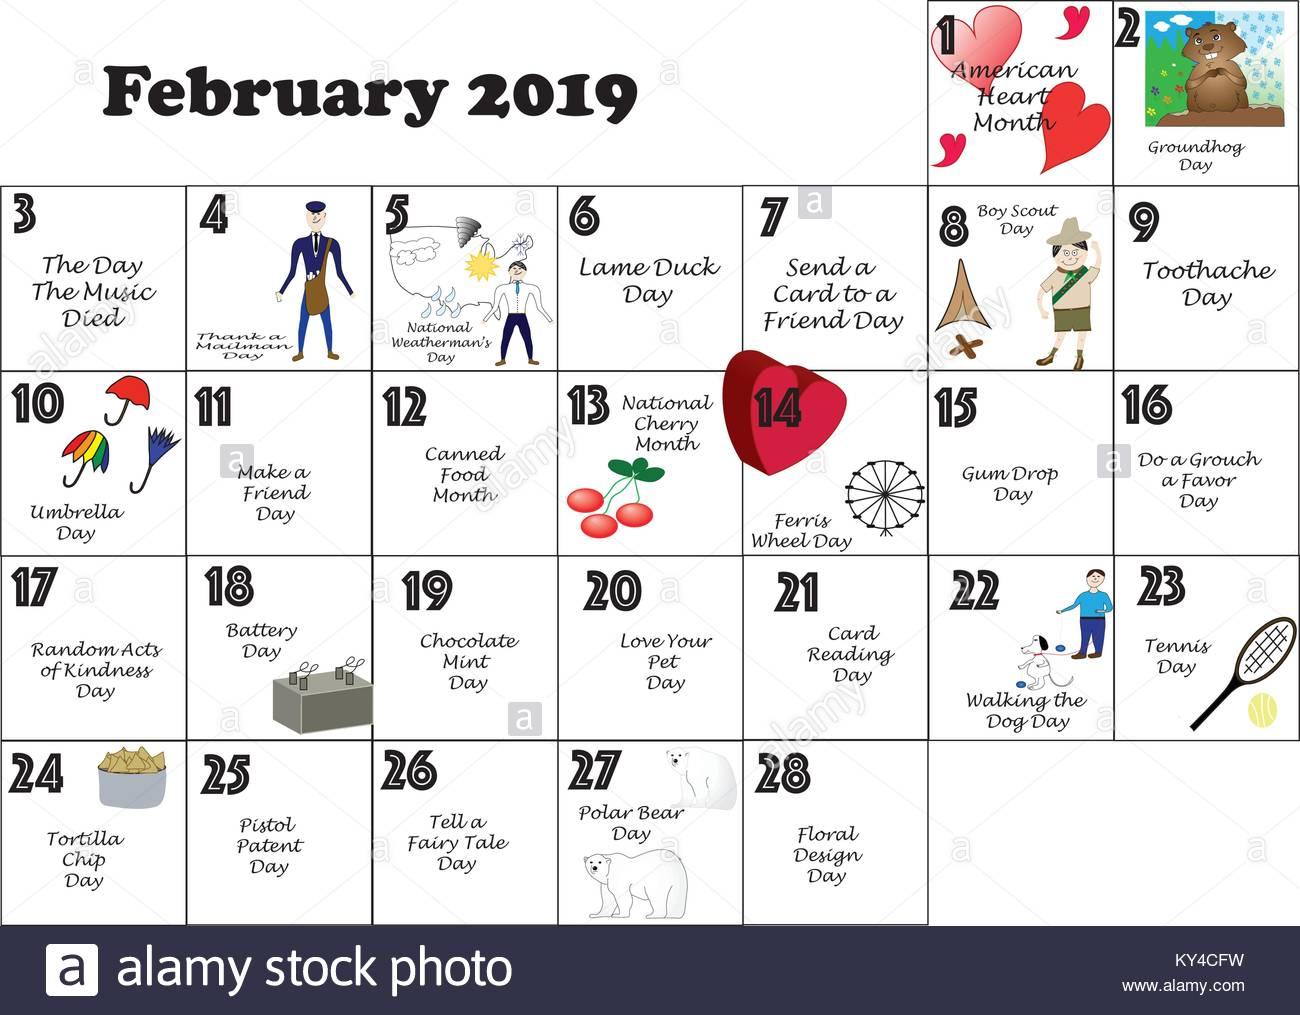 Calendario Con Festivita 2019.Febbraio 2019 Calendario Illustrato E Annotata Con Daily